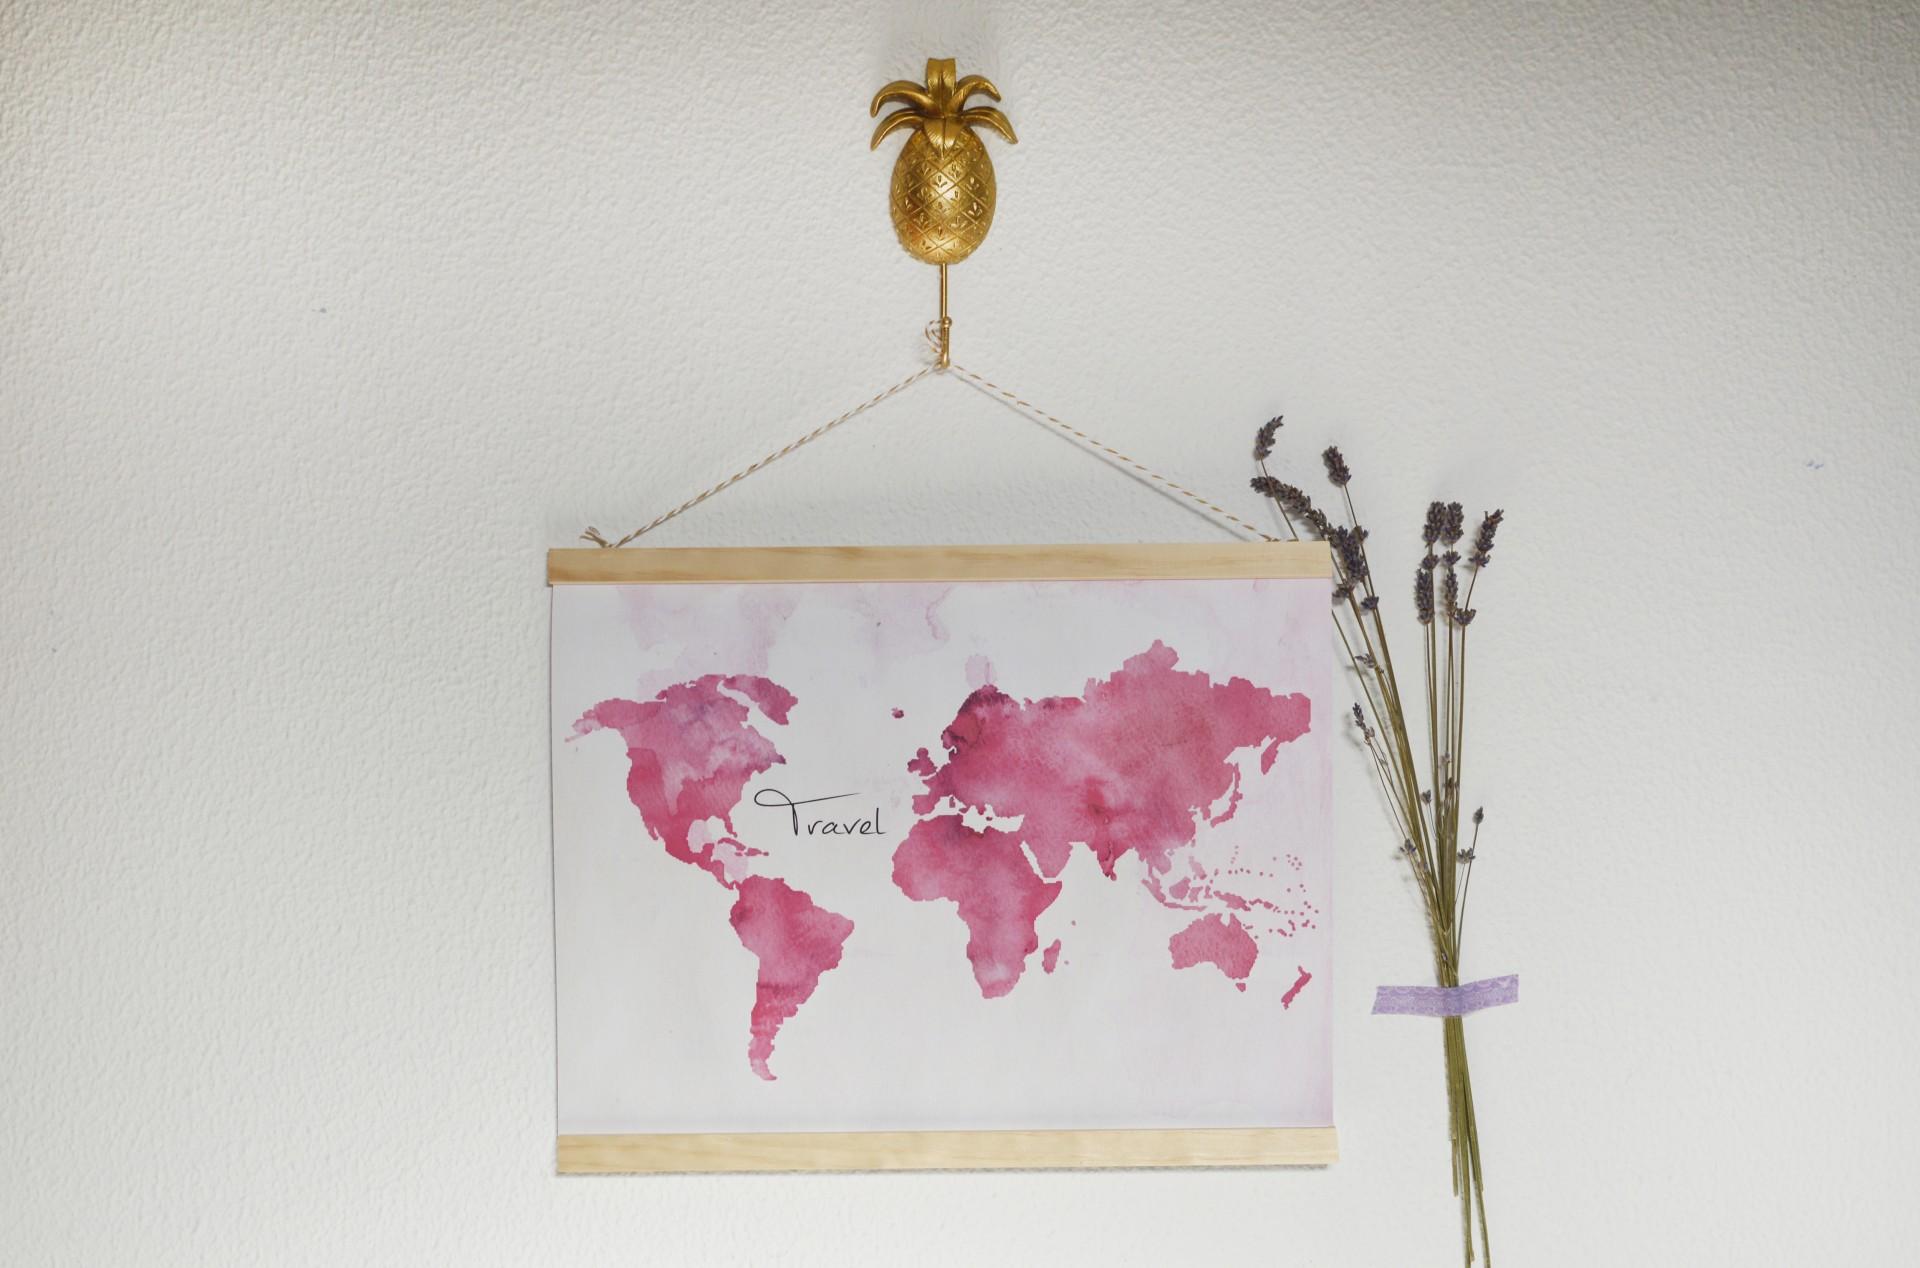 Travel Pink